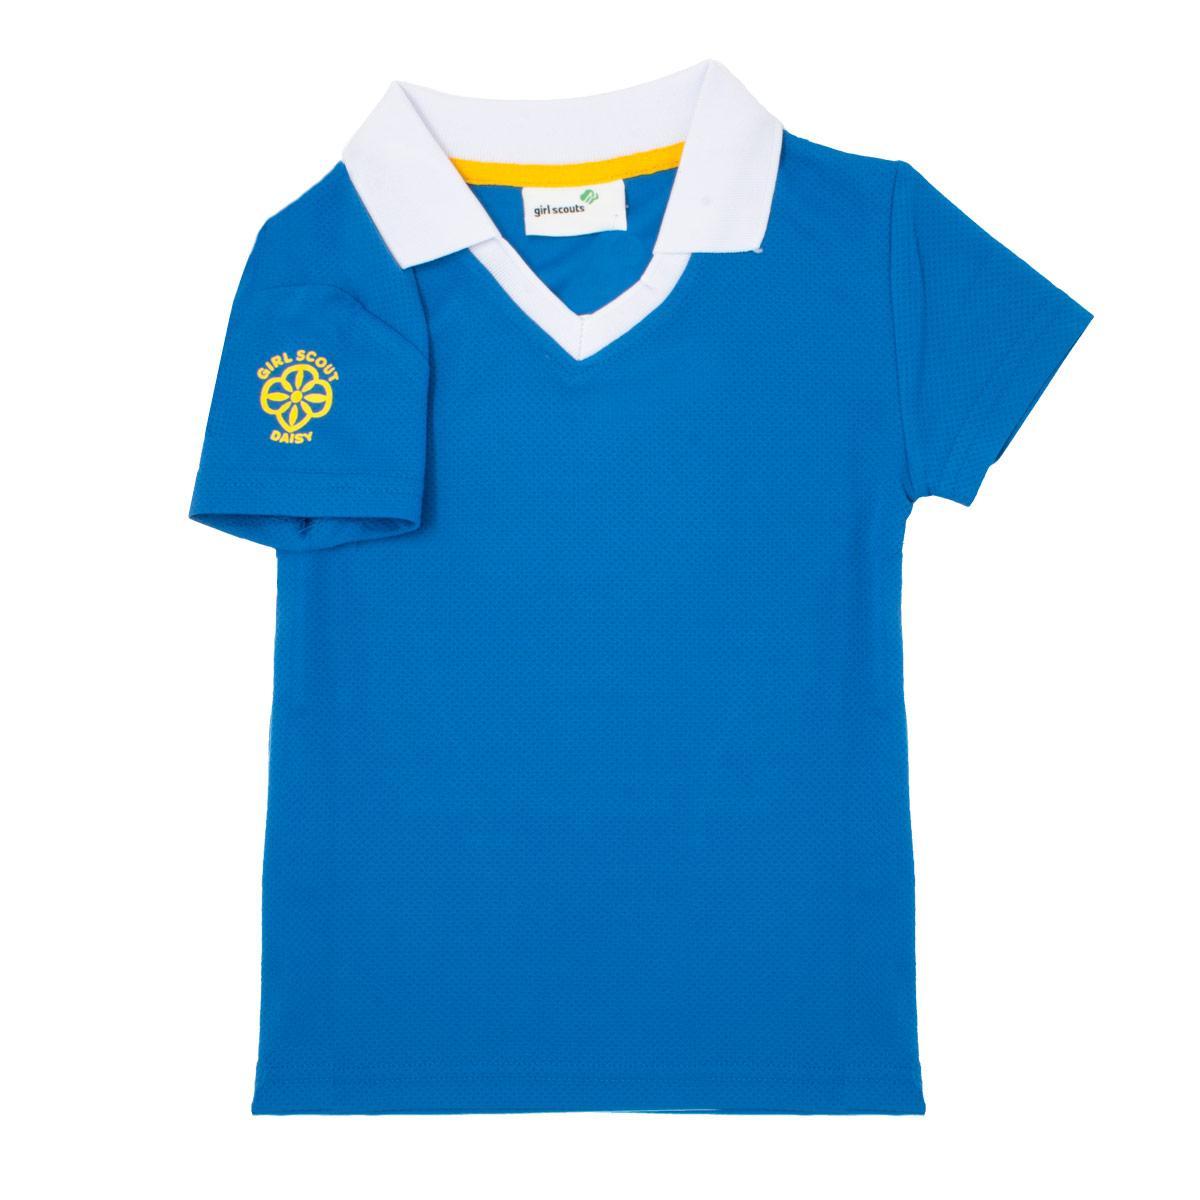 Official Daisy Activity Shirt